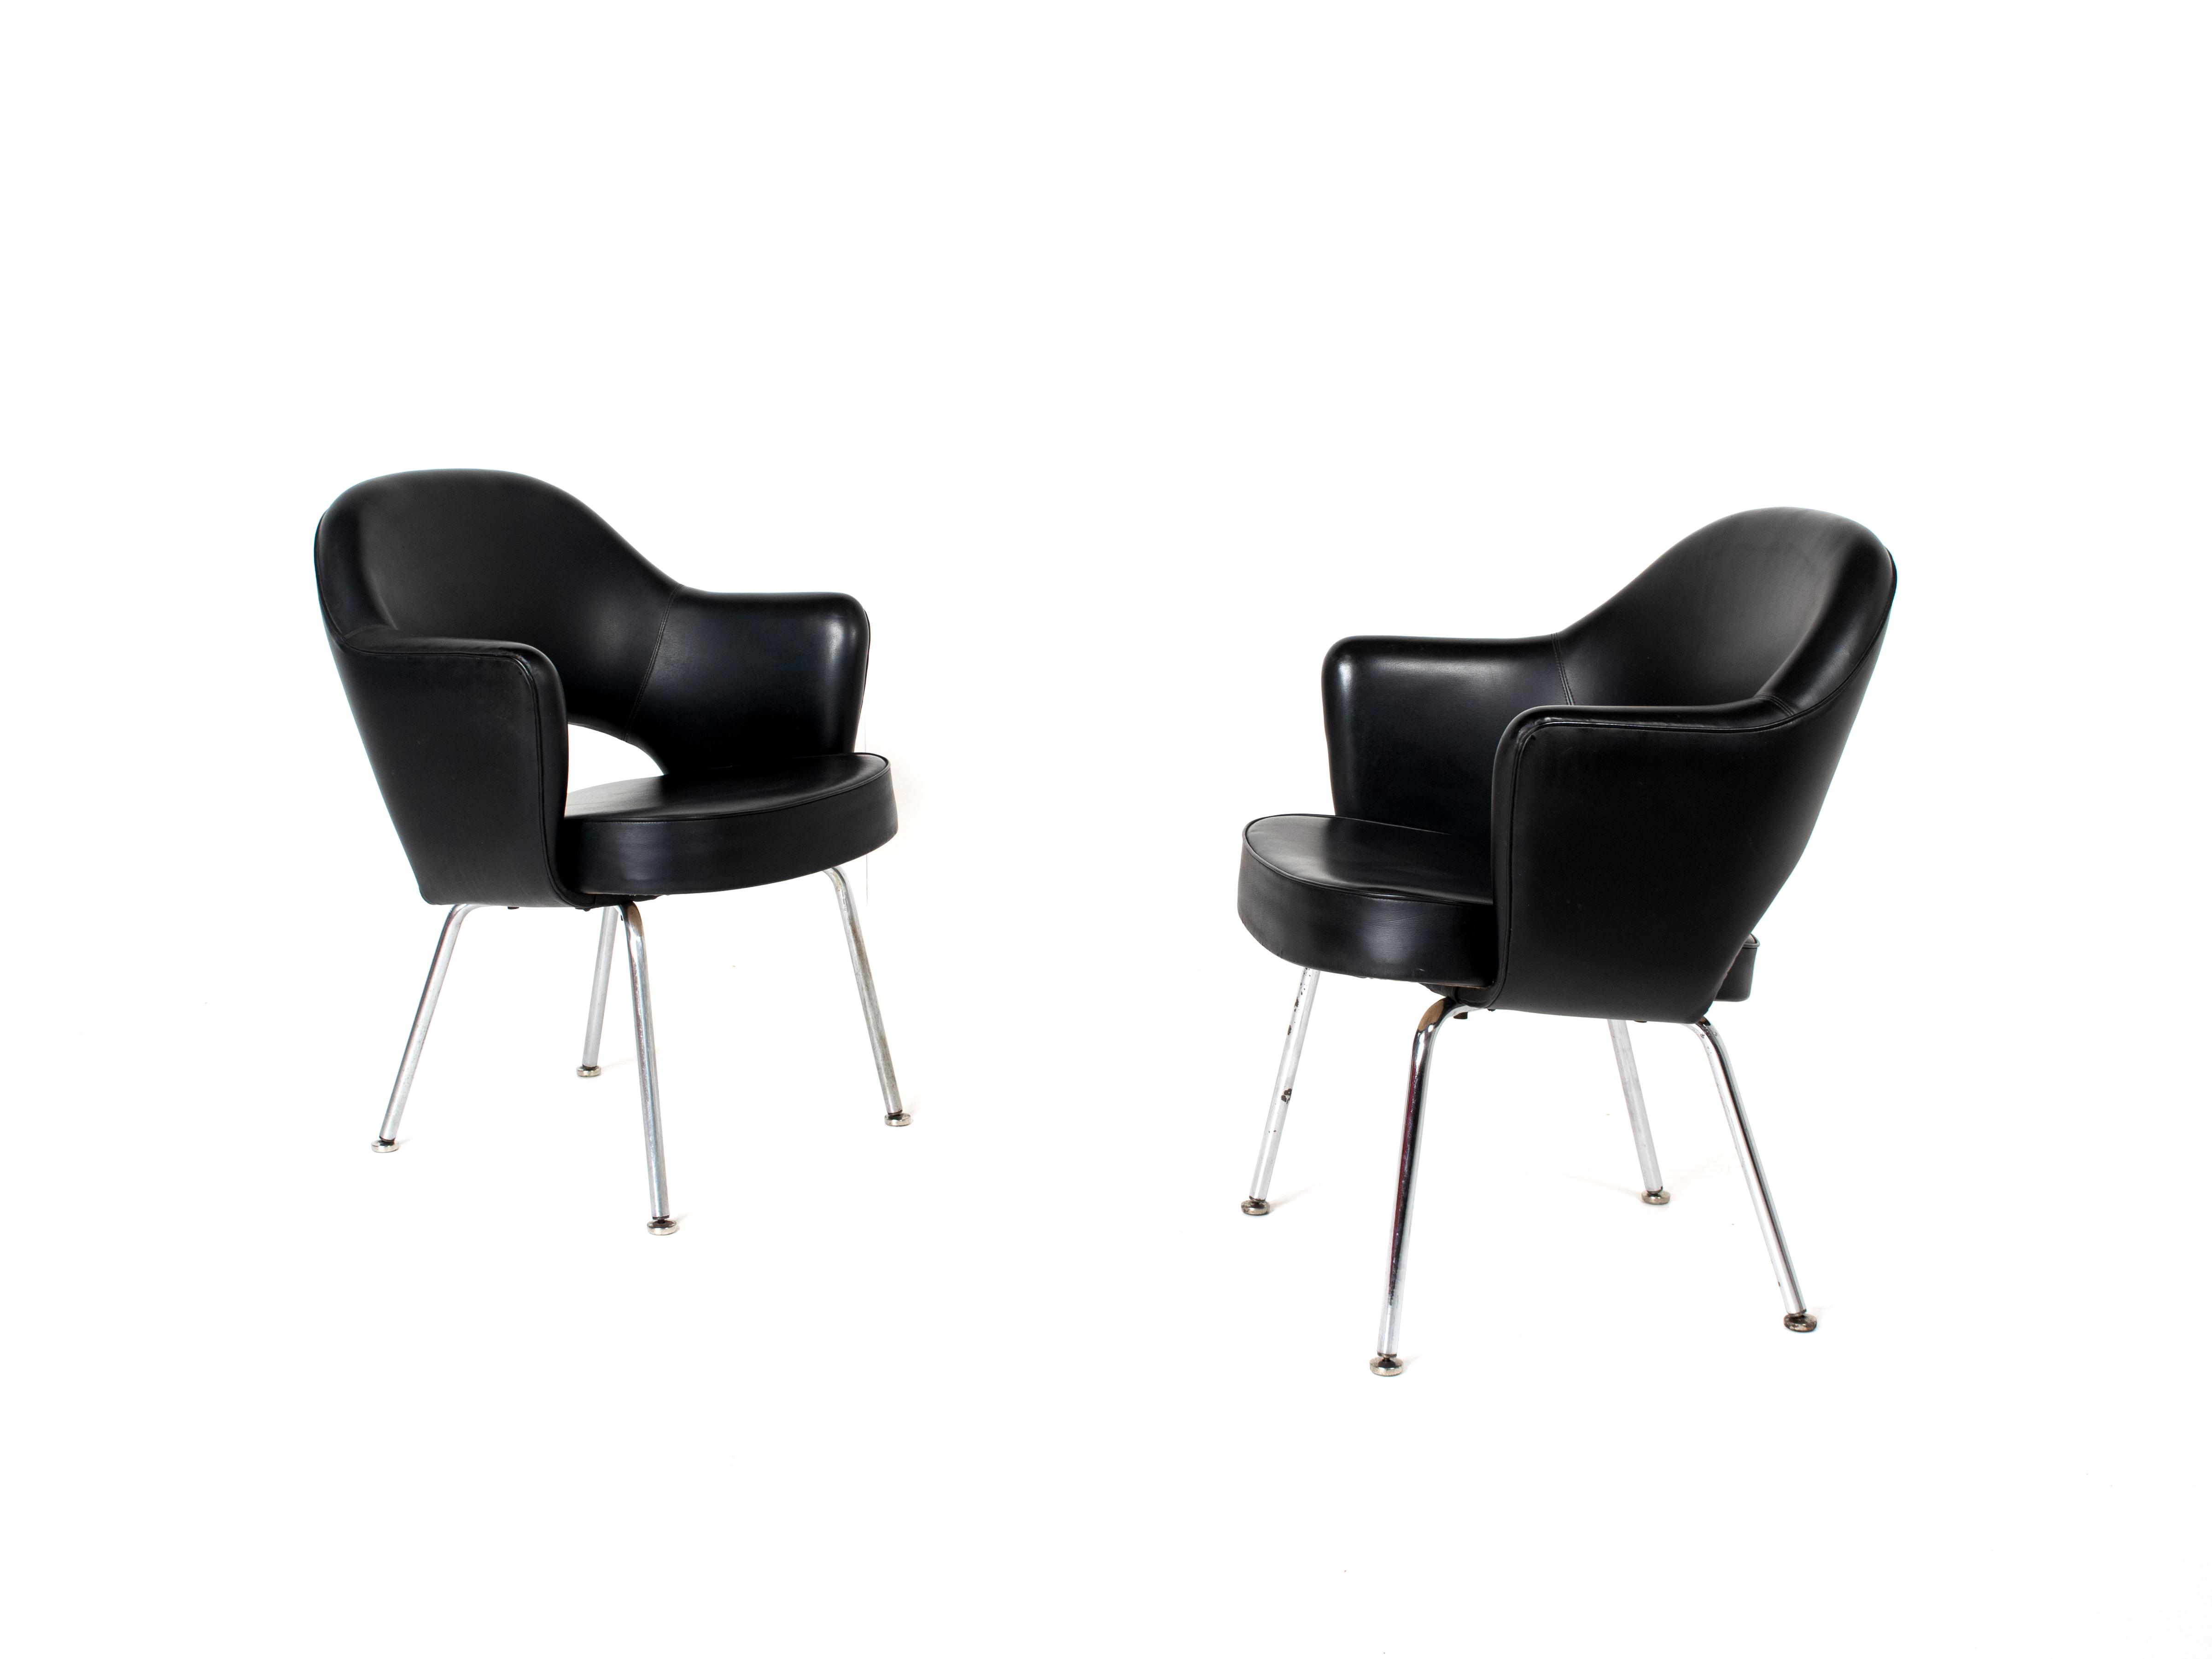 Set of Two Eero Saarinen Executive Chairs with Armrests for Knoll De Coene Belgium, 1950s